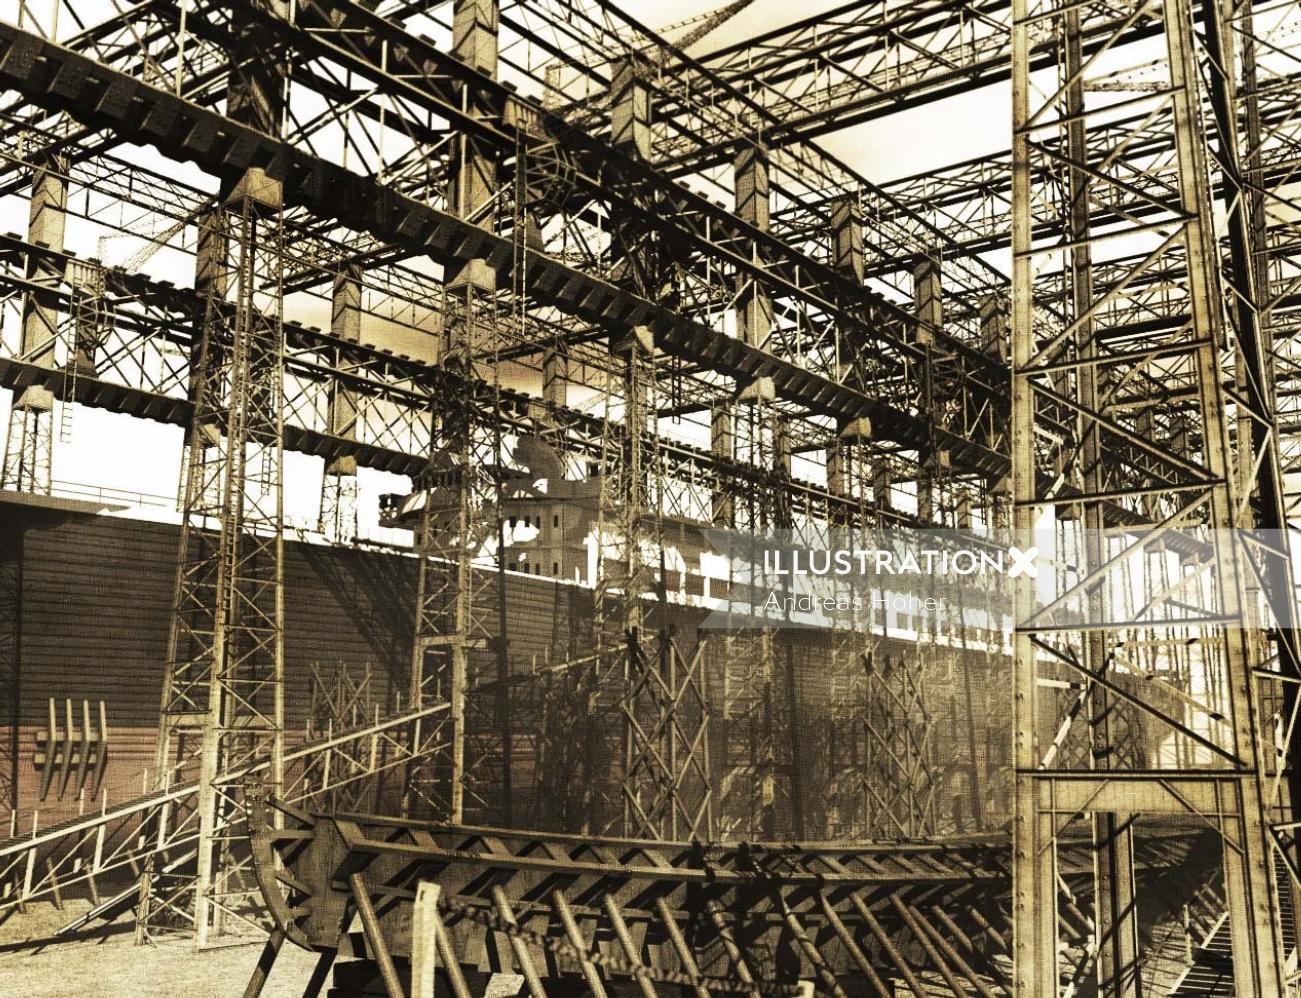 Digital painting of harland Wolff shipyard 1911